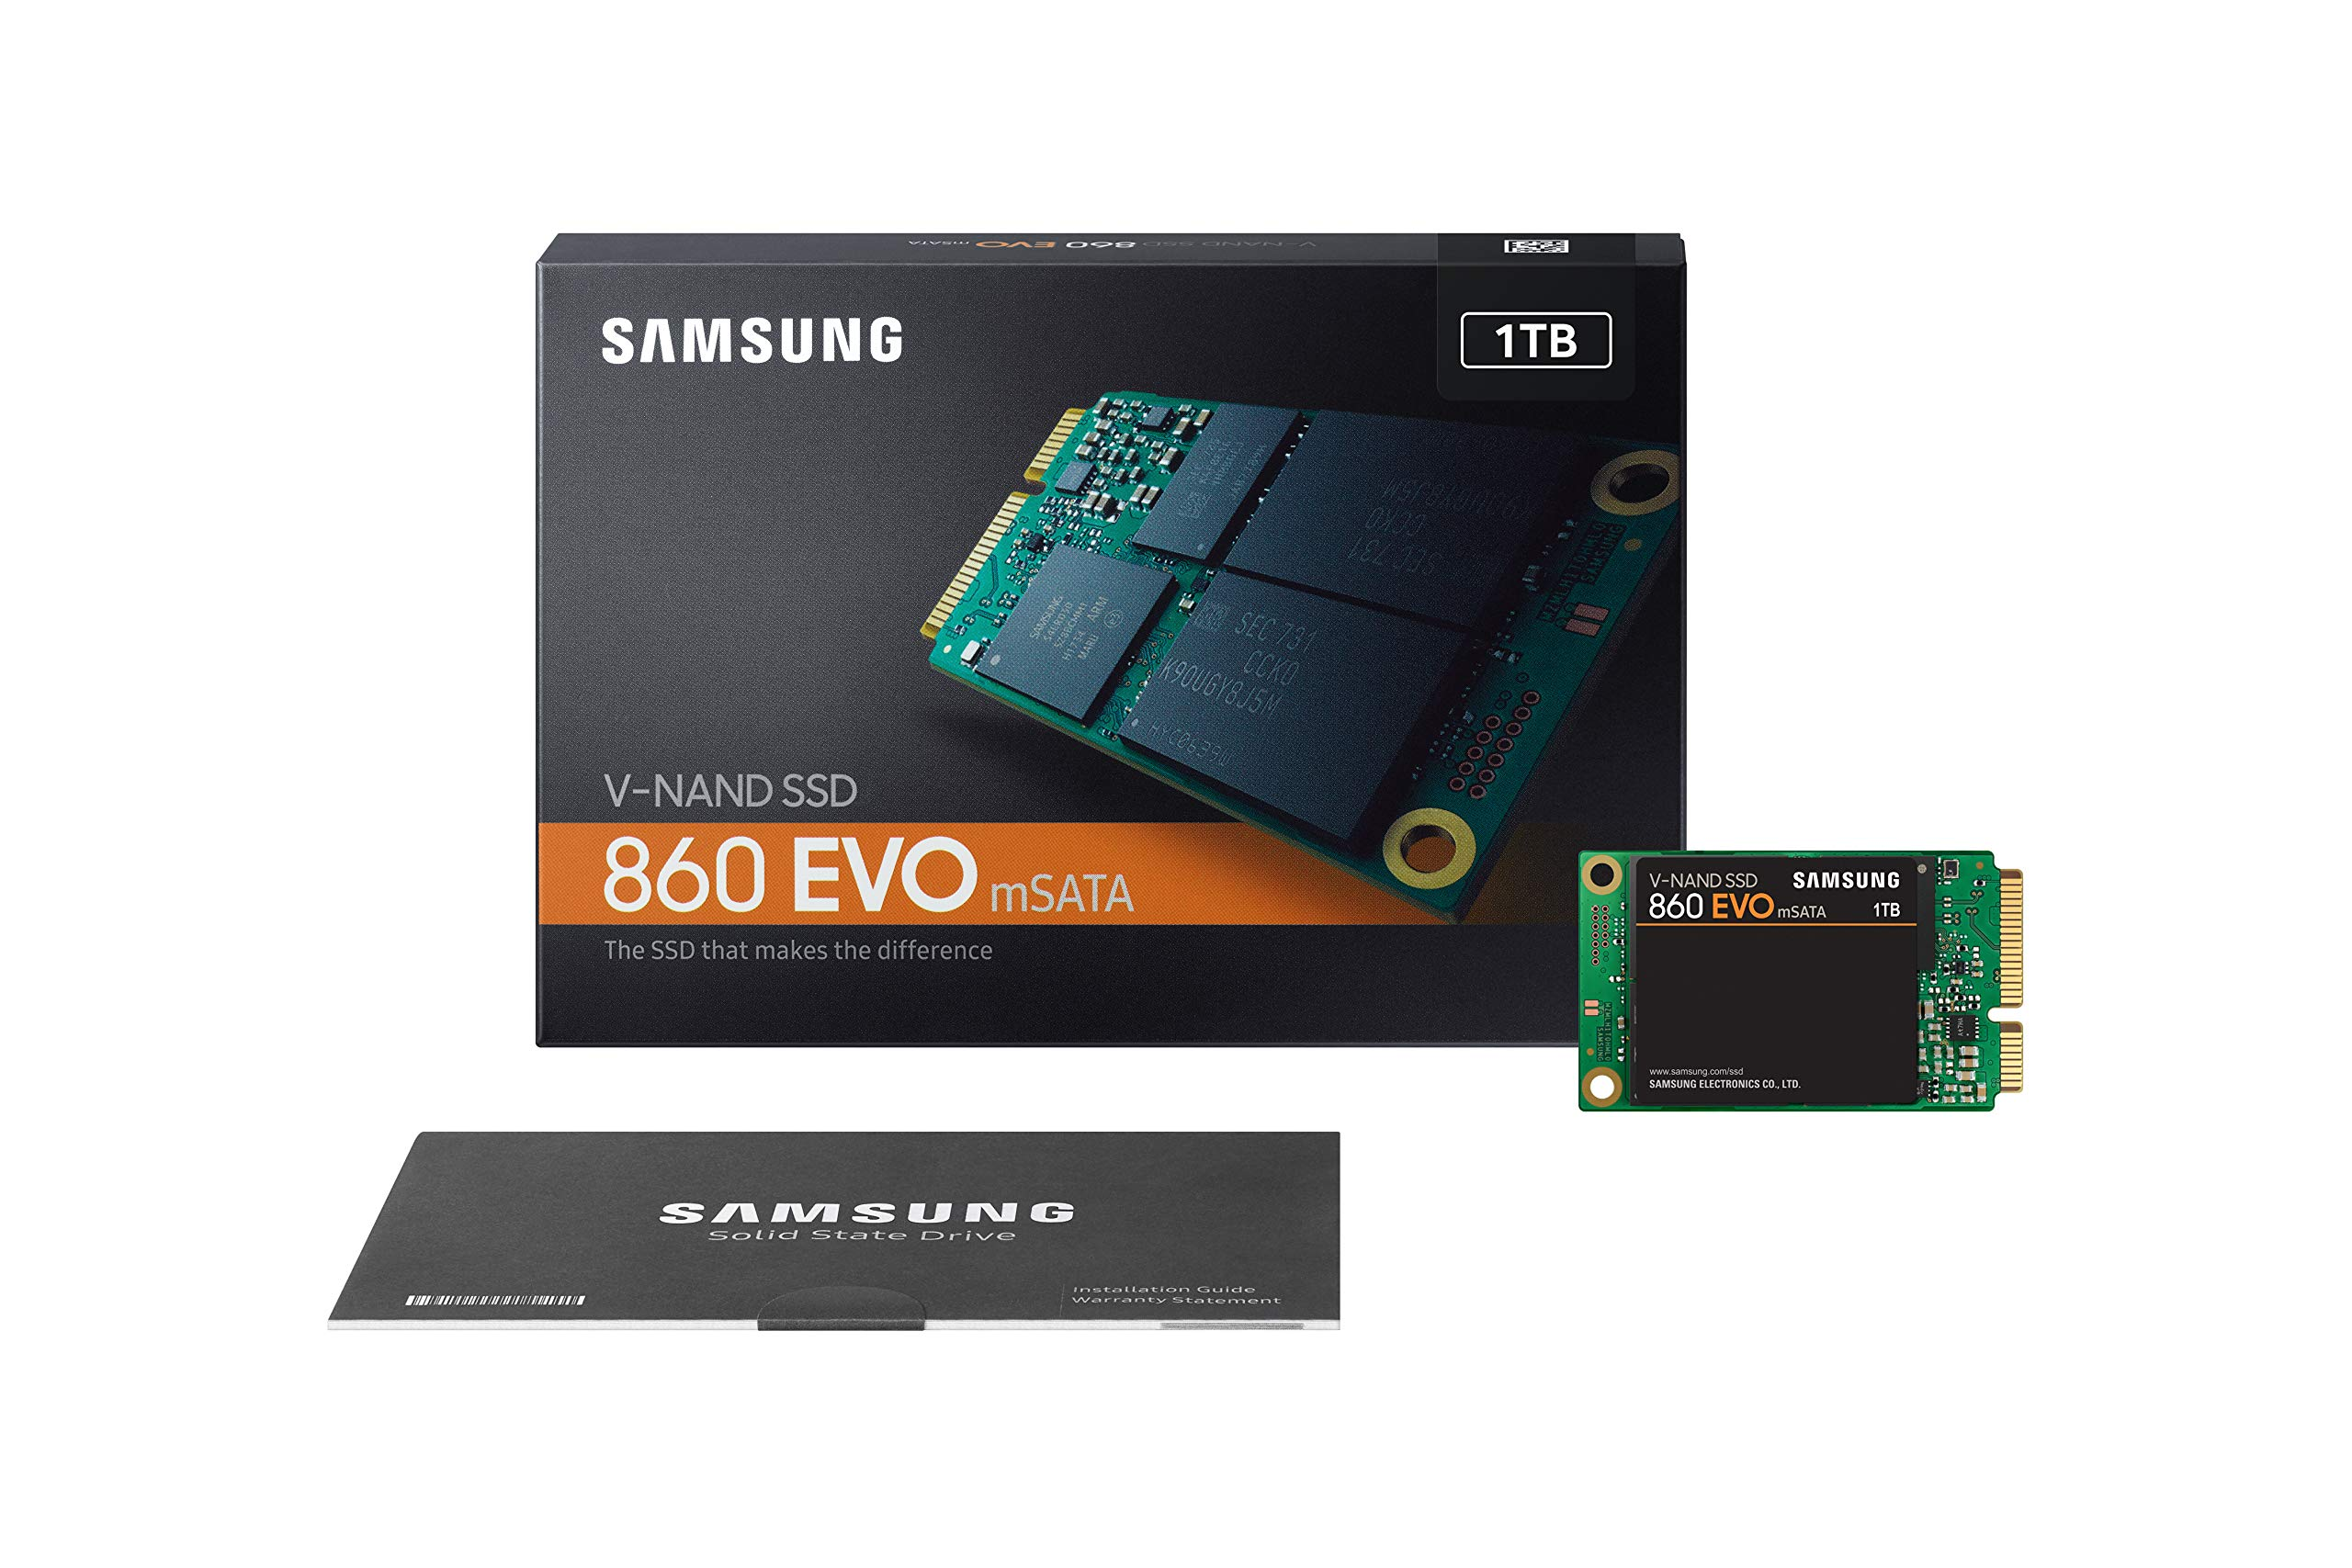 Samsung SSD 860 EVO 1TB mSATA Internal SSD (MZ-M6E1T0BW) by Samsung (Image #9)